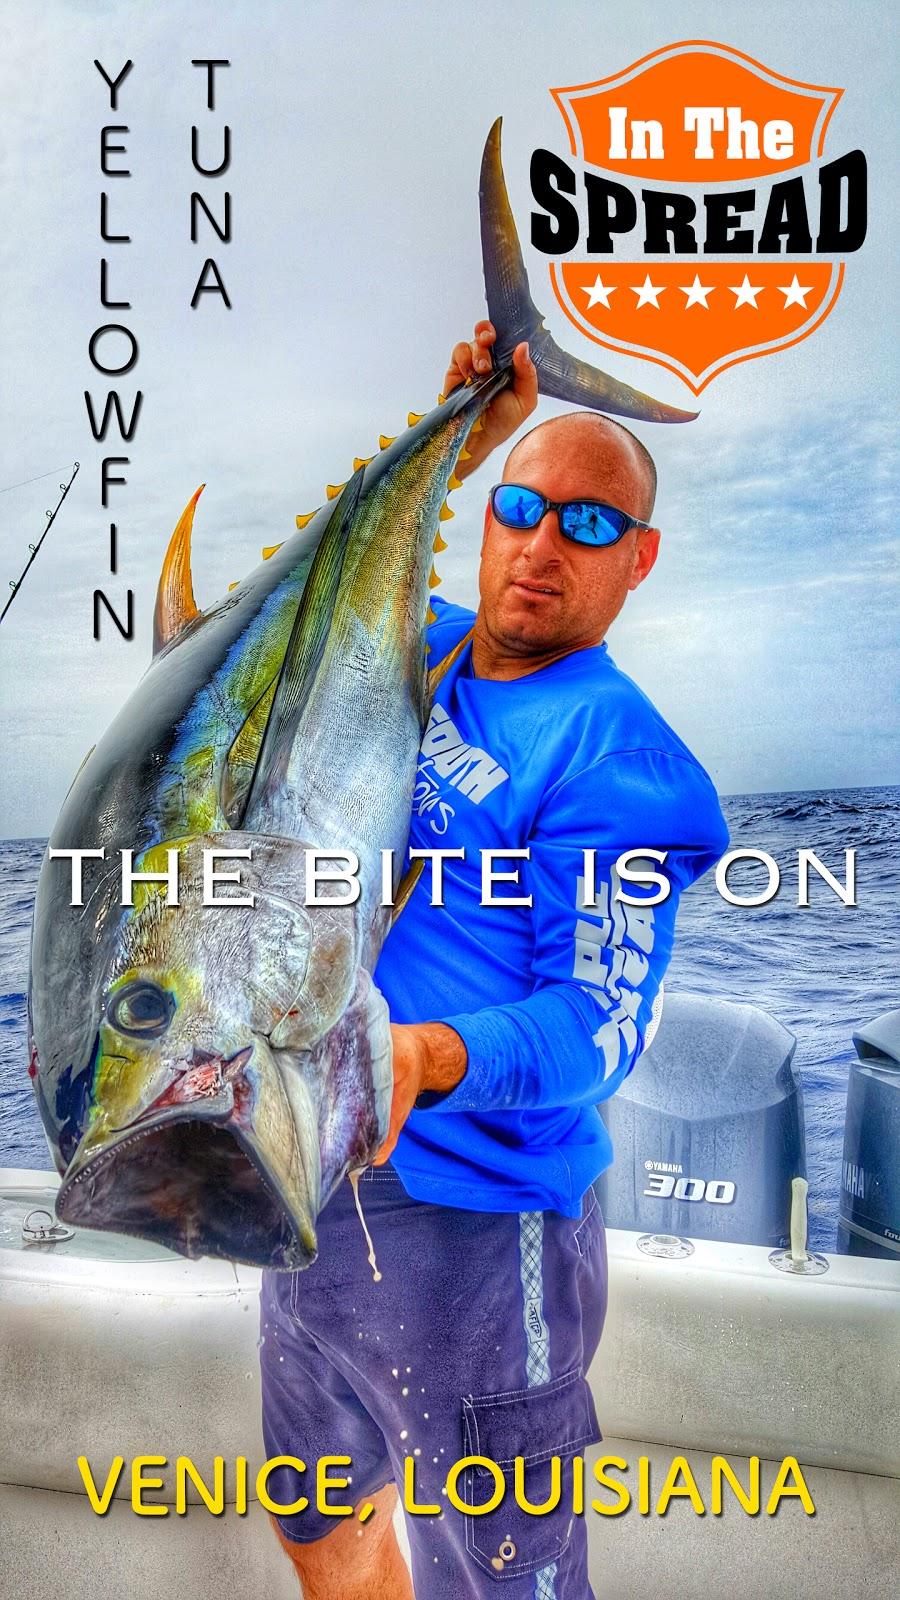 how to catch yellowfin tuna in louisiana